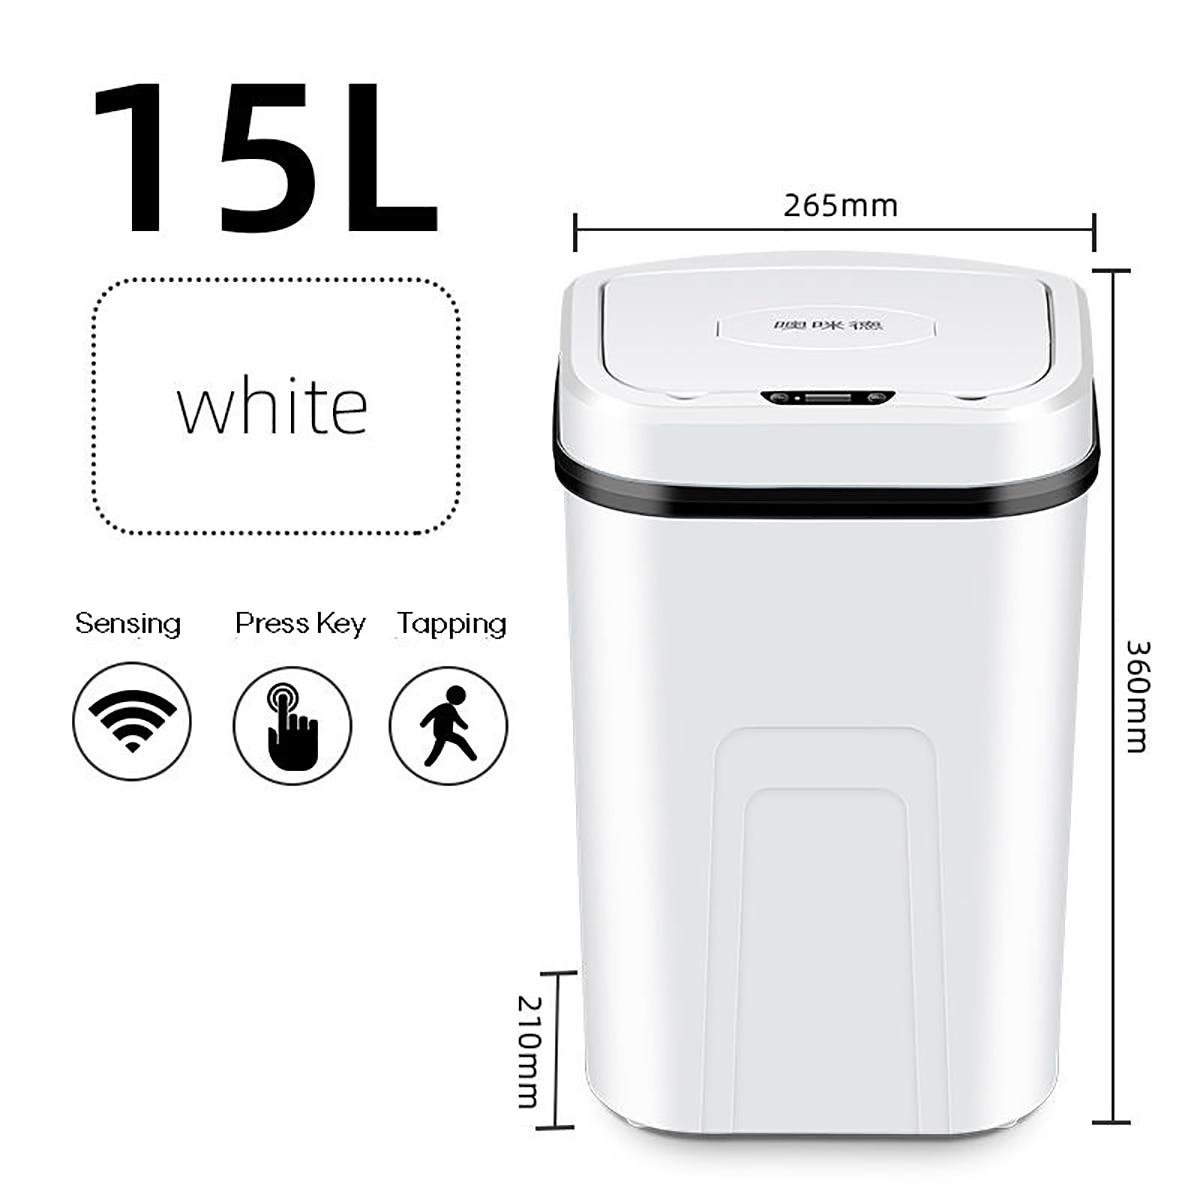 15L التلقائي Touchless ذكي التعريفي محس حركة حاوية القمامة المطبخ واسعة افتتاح الاستشعار صديقة للبيئة النفايات Garbag